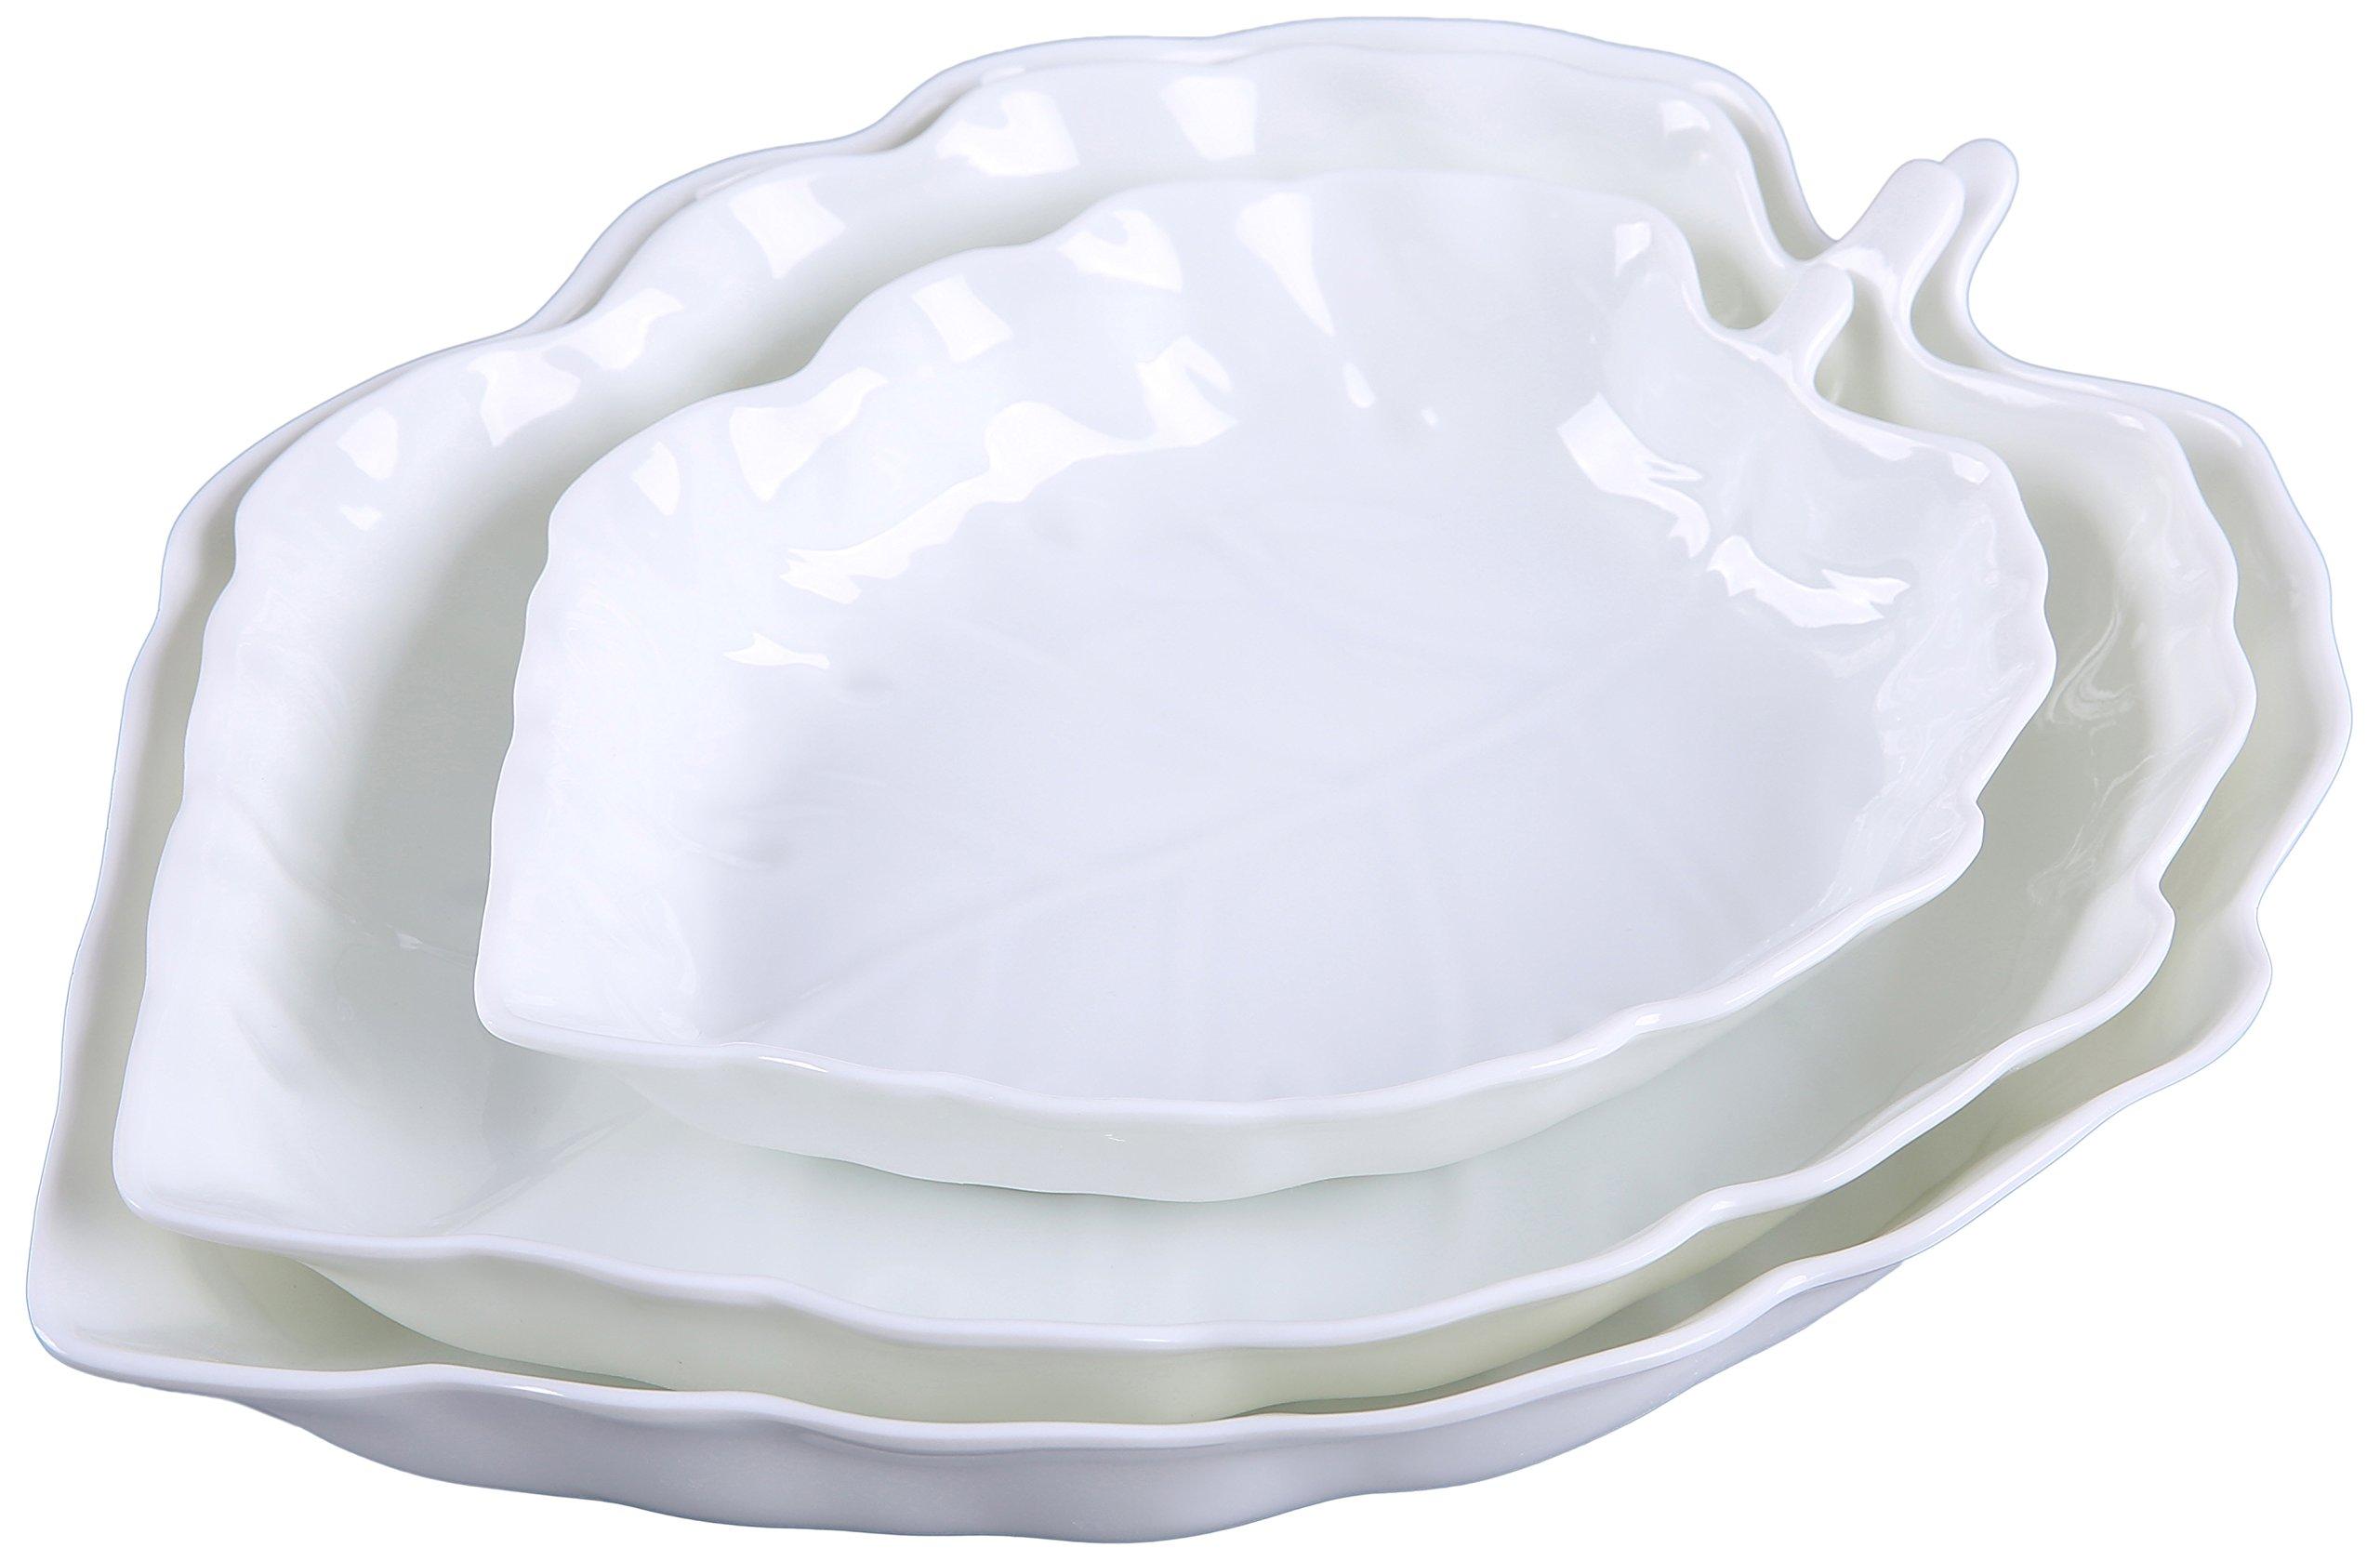 SHALL Housewares 8116 3 Piece Melamine Leaf Serving Tray 3, White